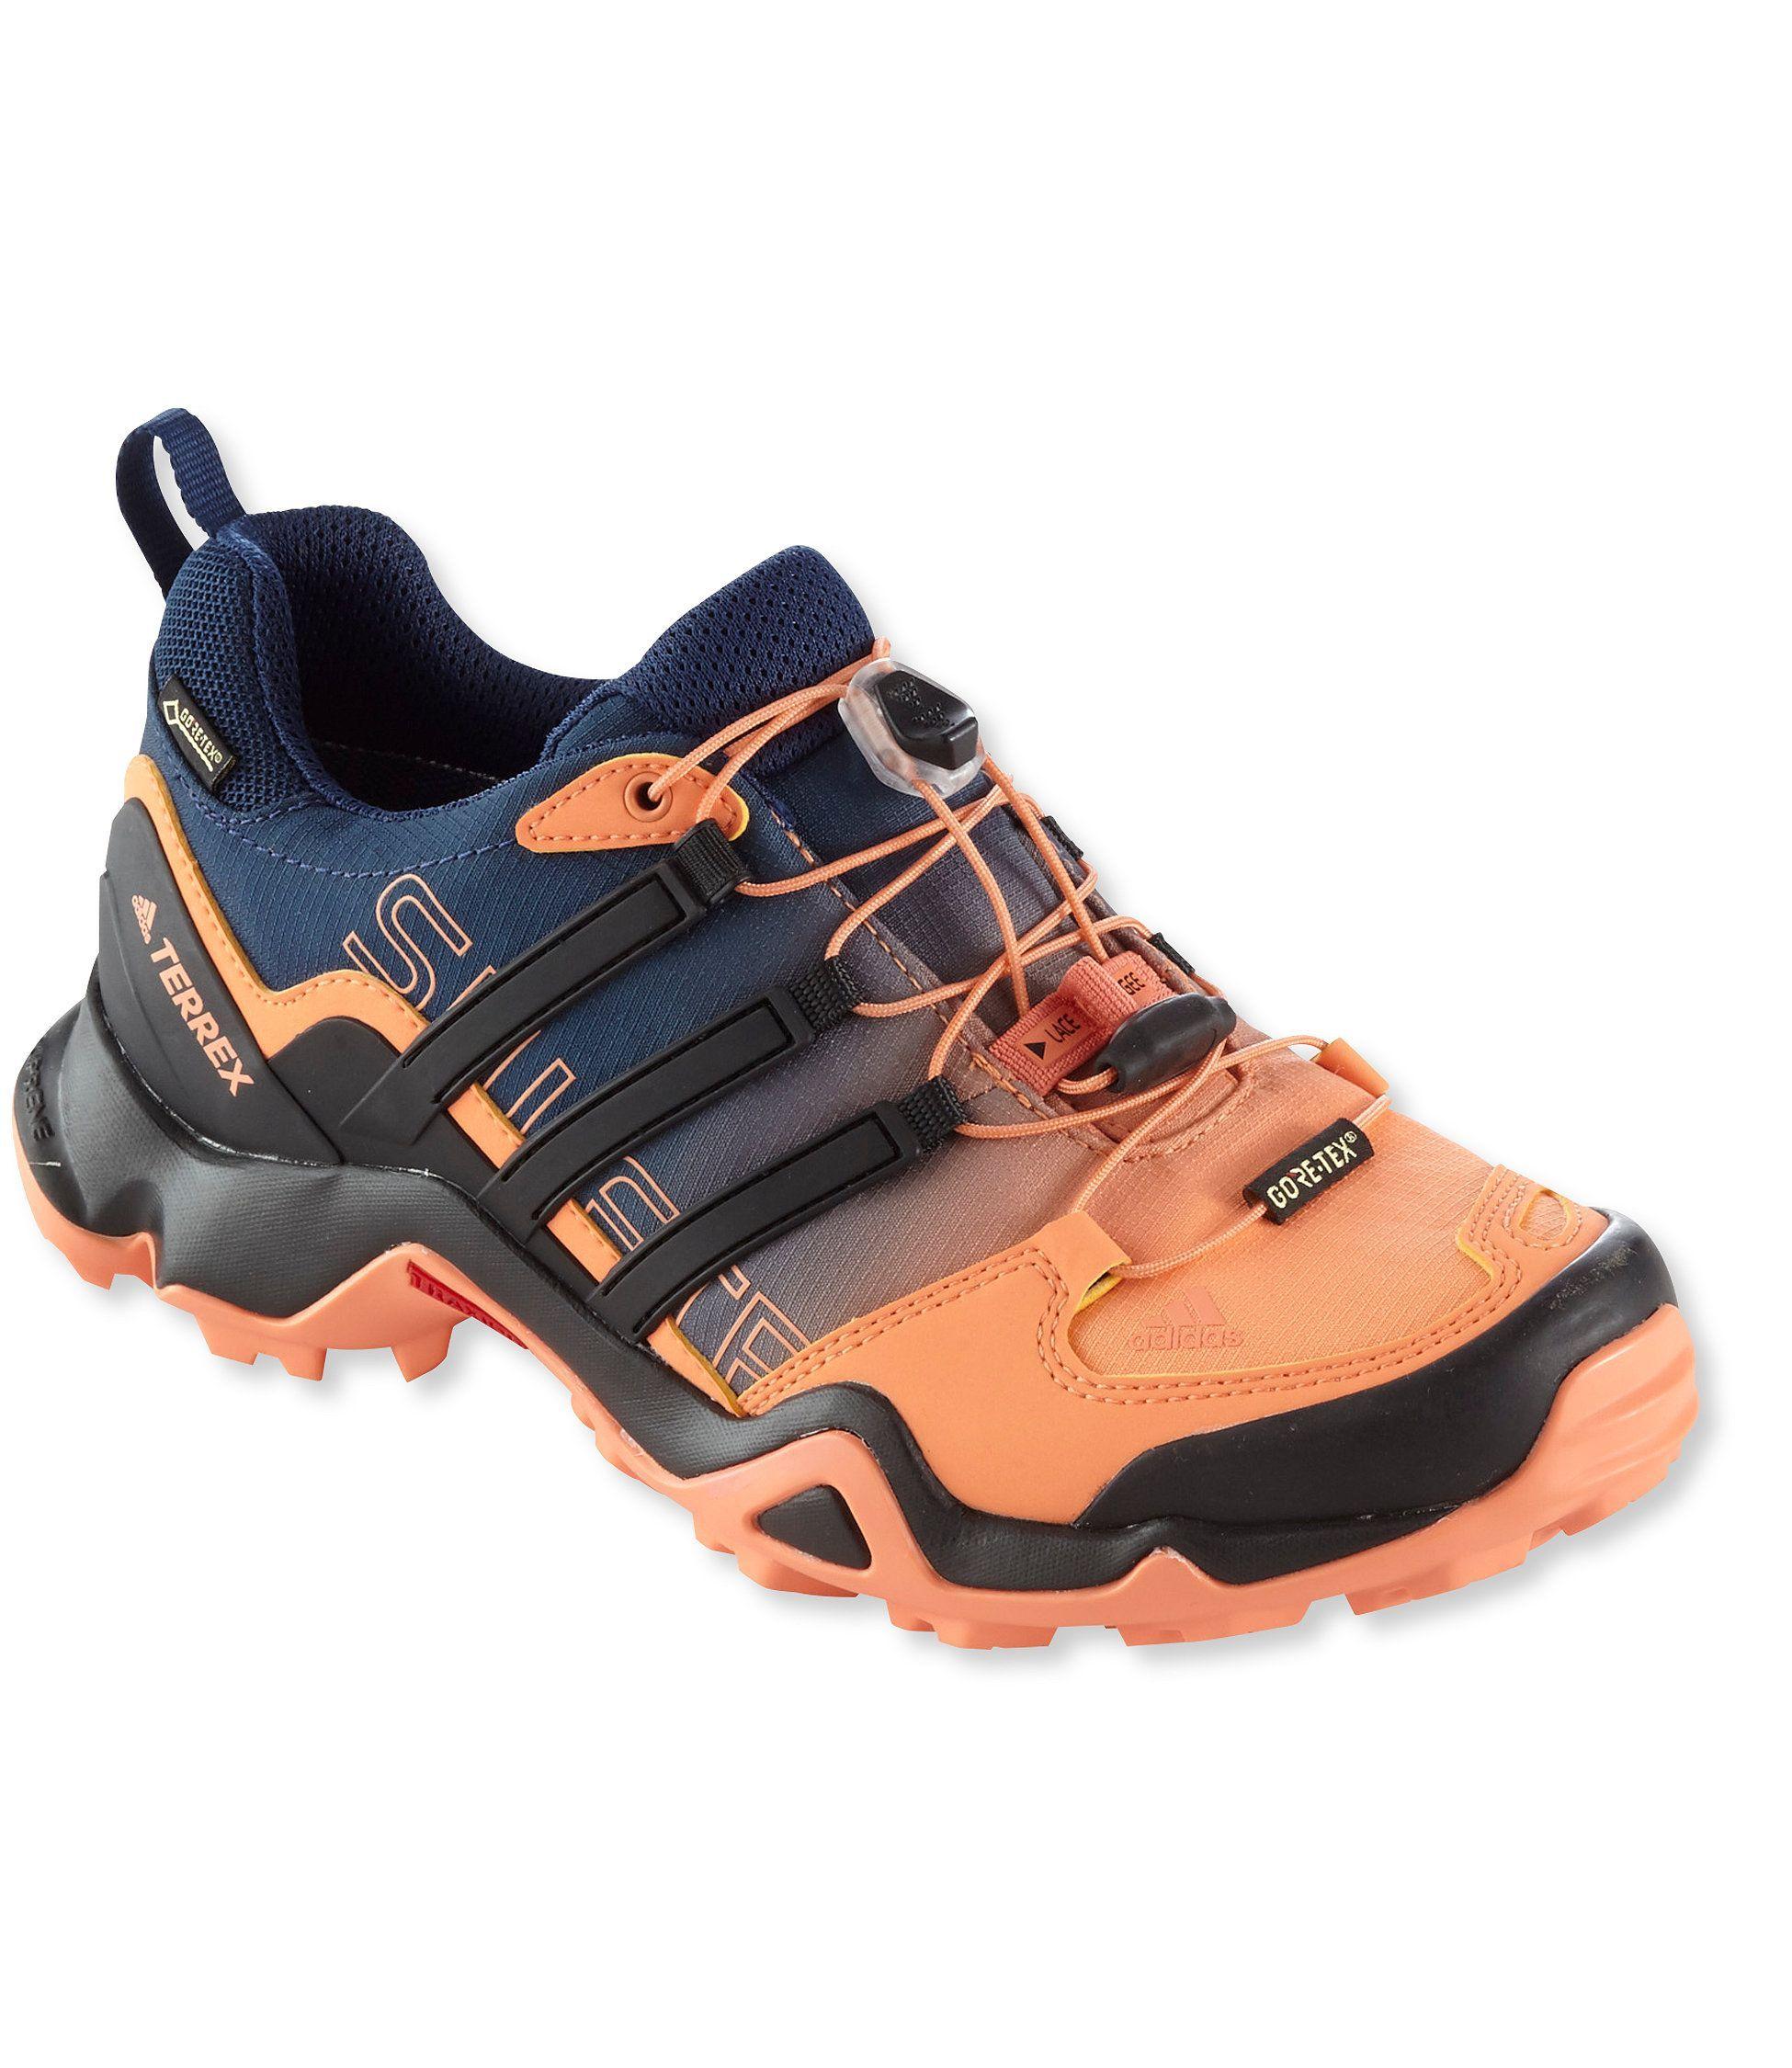 022683319 Women s Adidas Terrex Swift R Gore-Tex Hiking Shoes